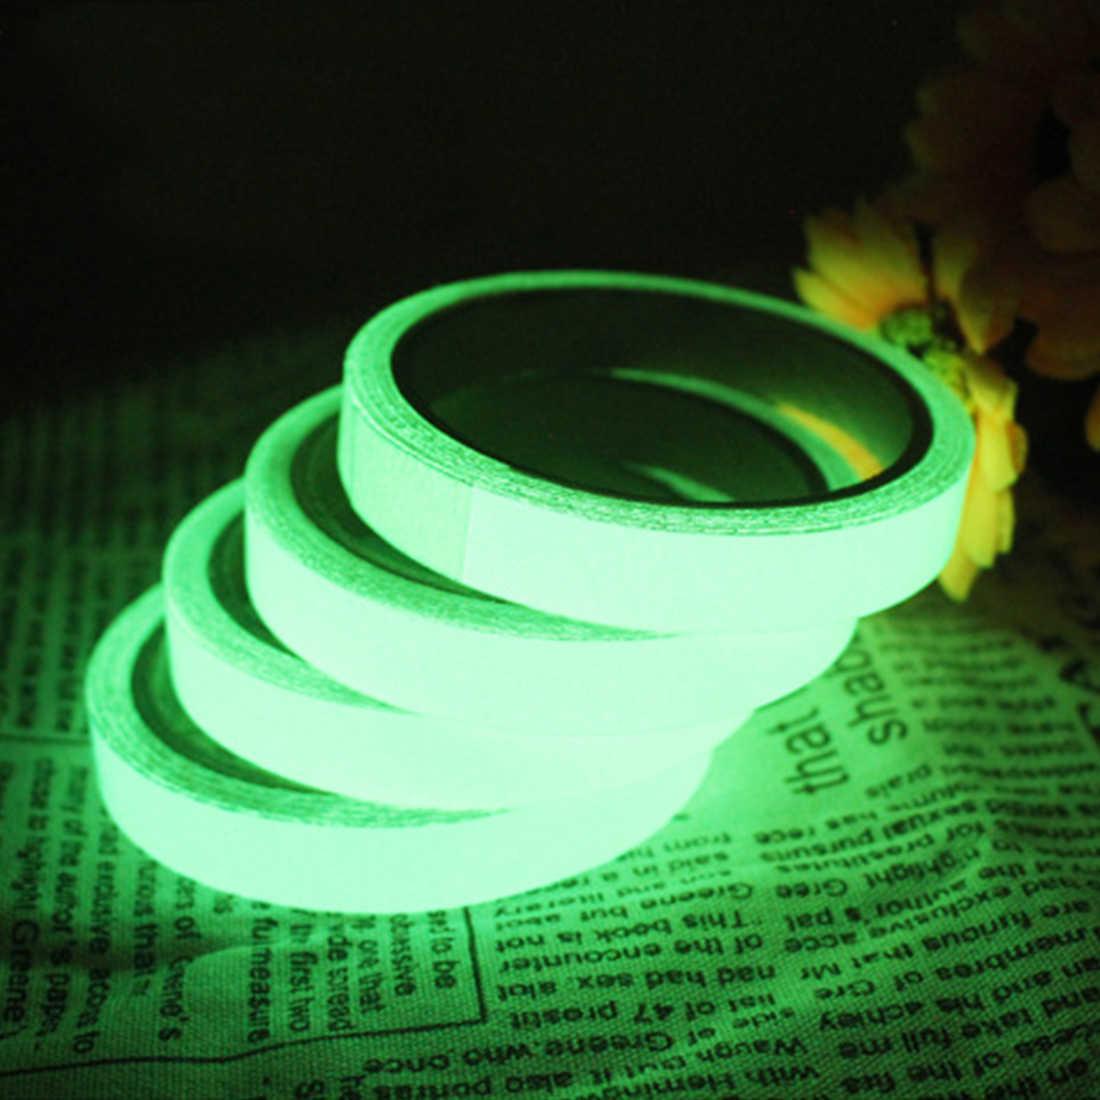 New Luminous Film Fluorescence Self Illuminating Tape Glow In The Dark Warning Ribbon Night Vision Car Stickers Car Styling Car Stickers Aliexpress